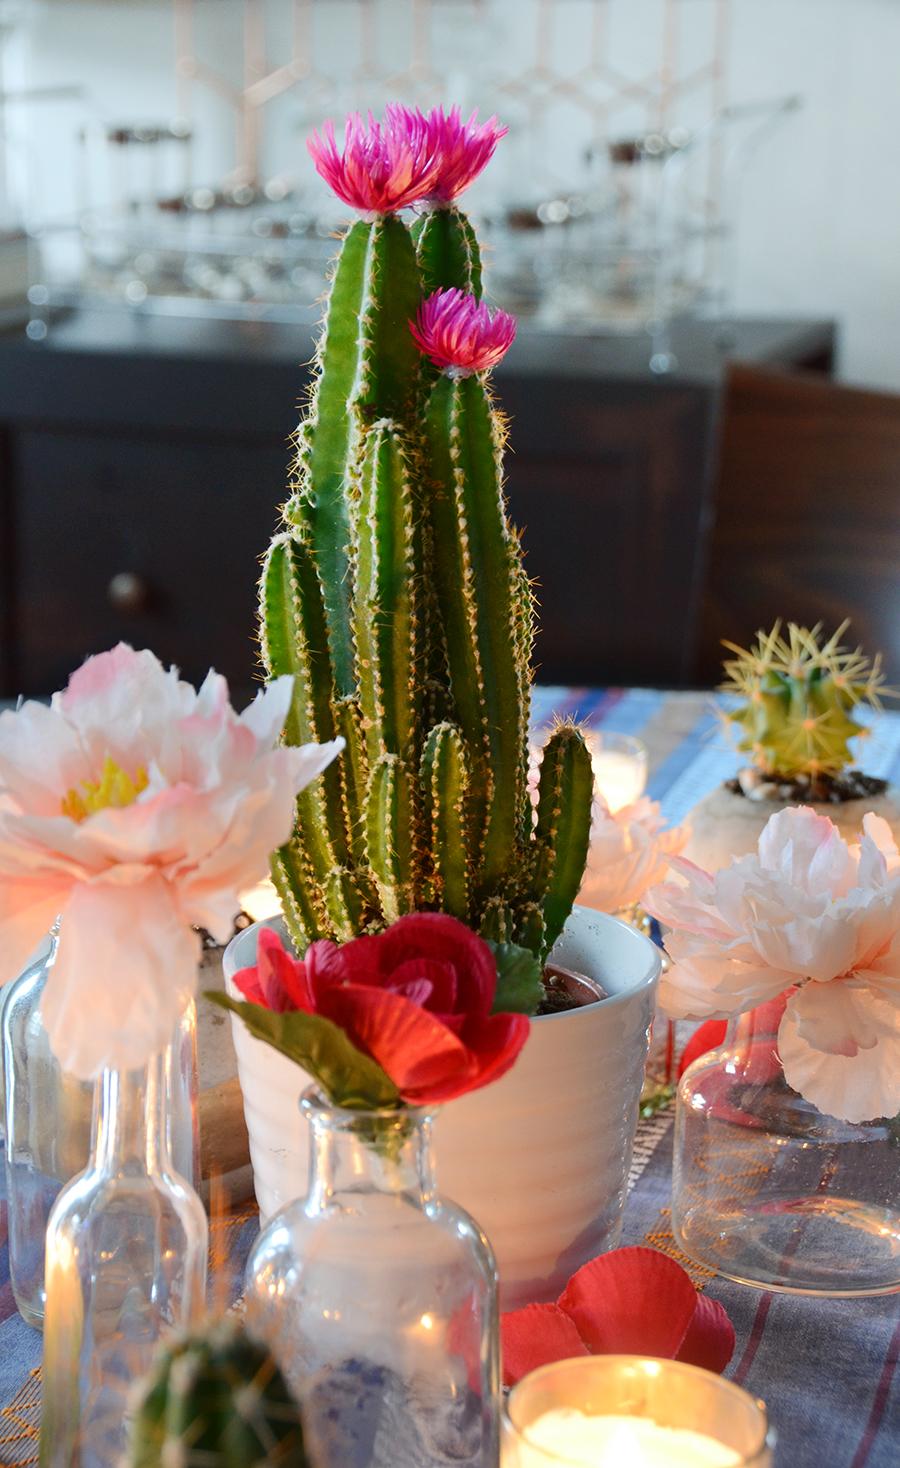 Make Your Own Stylish Cinco De Mayo Centerpiece